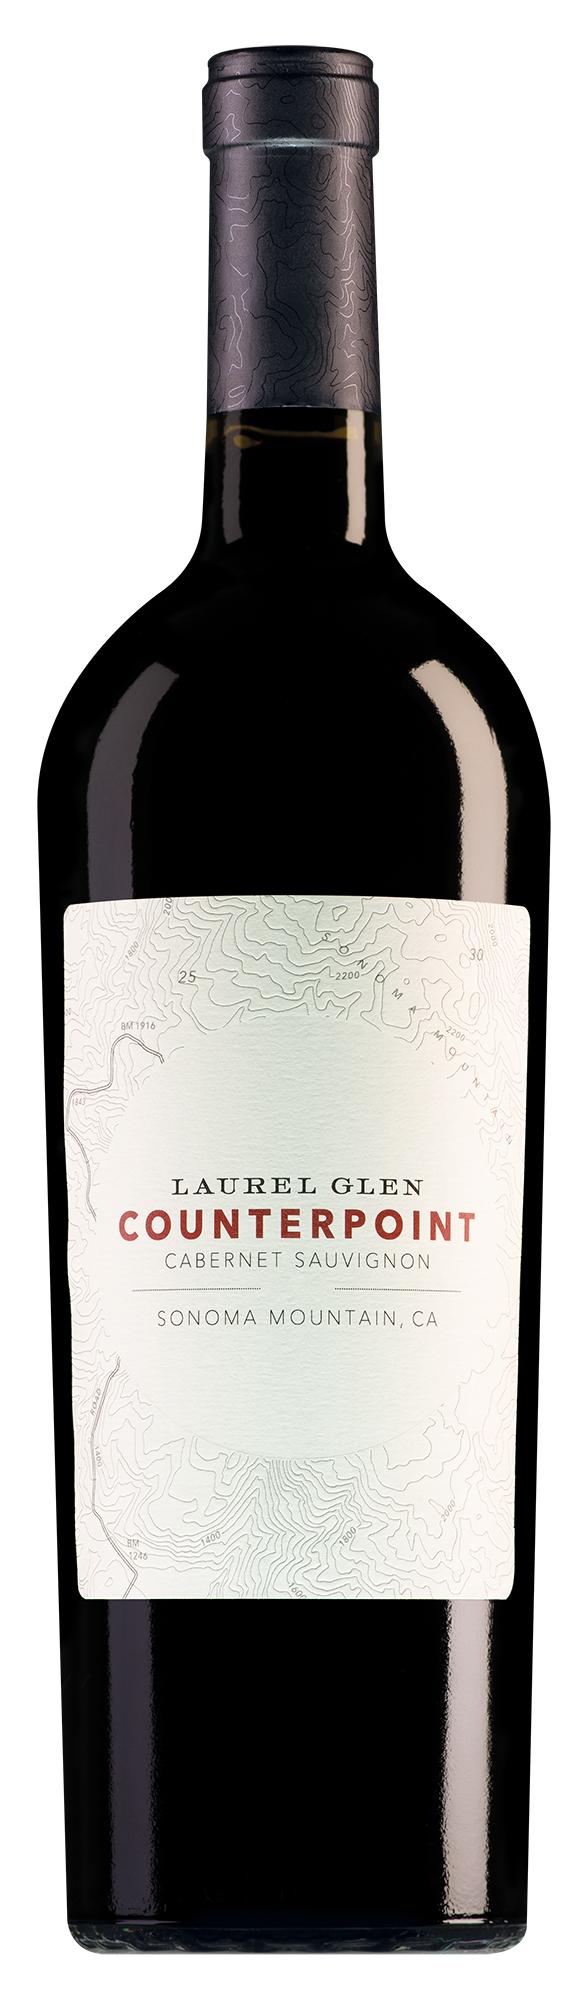 Laurel Glen Sonoma Mountain Counterpoint Cabernet Sauvignon